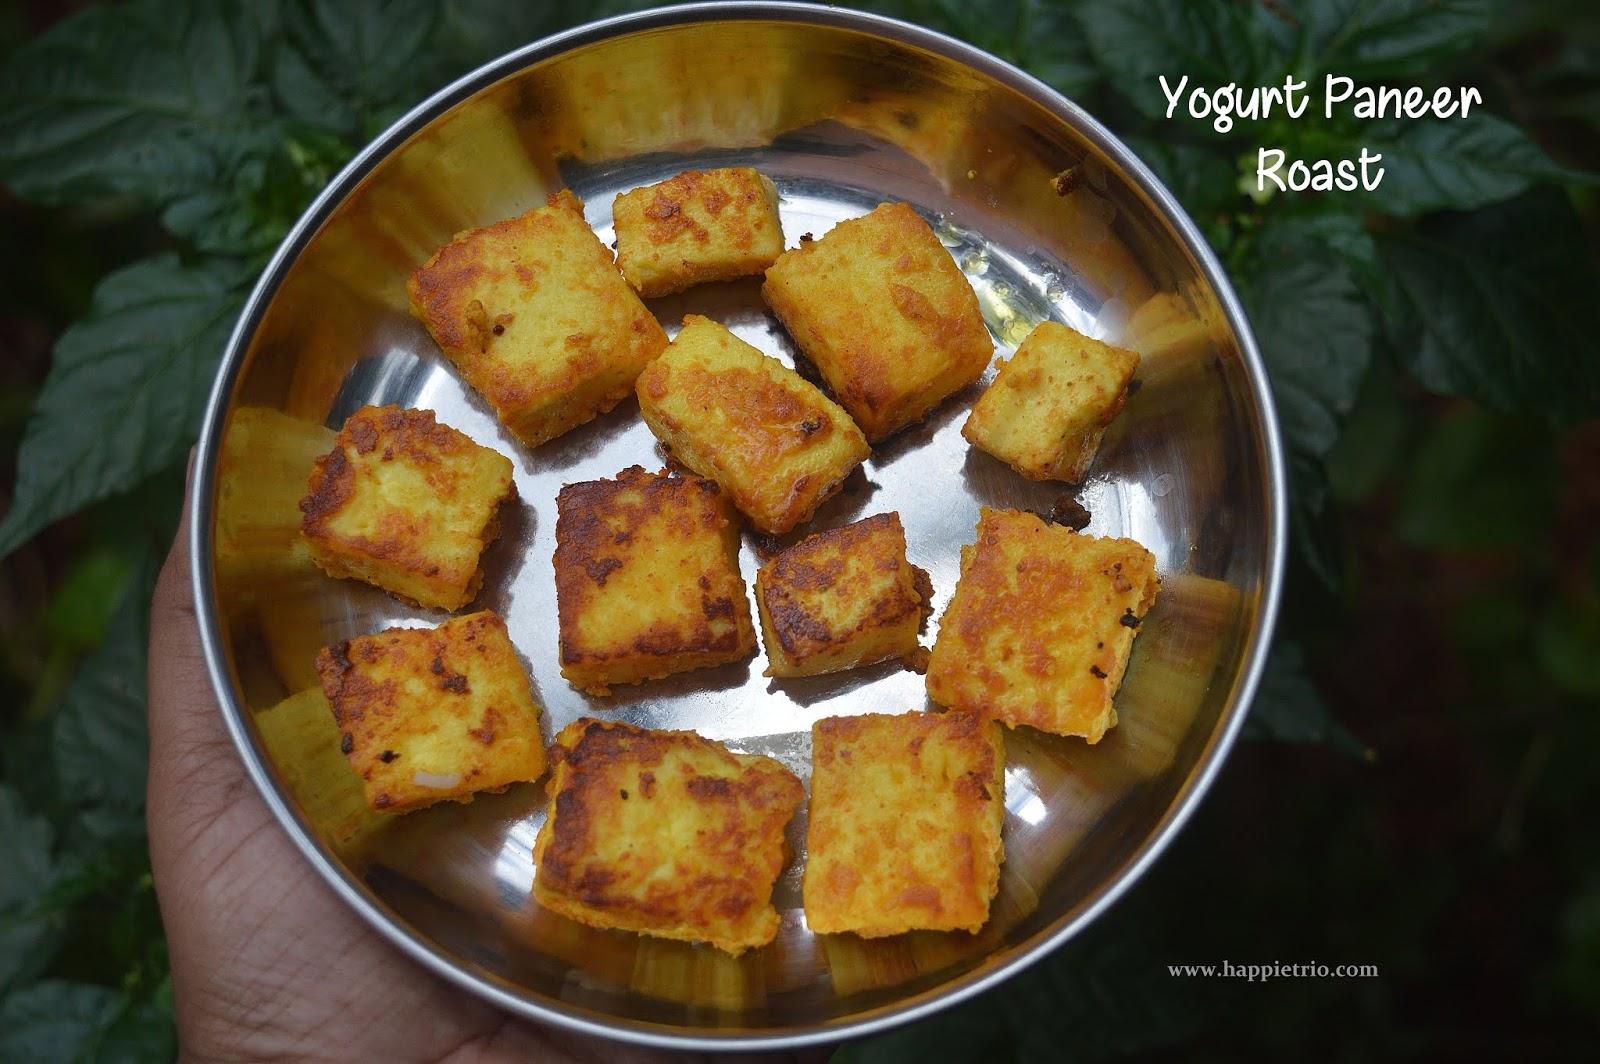 Yogurt Paneer Roast Recipe | Easy Paneer Roast Recipe